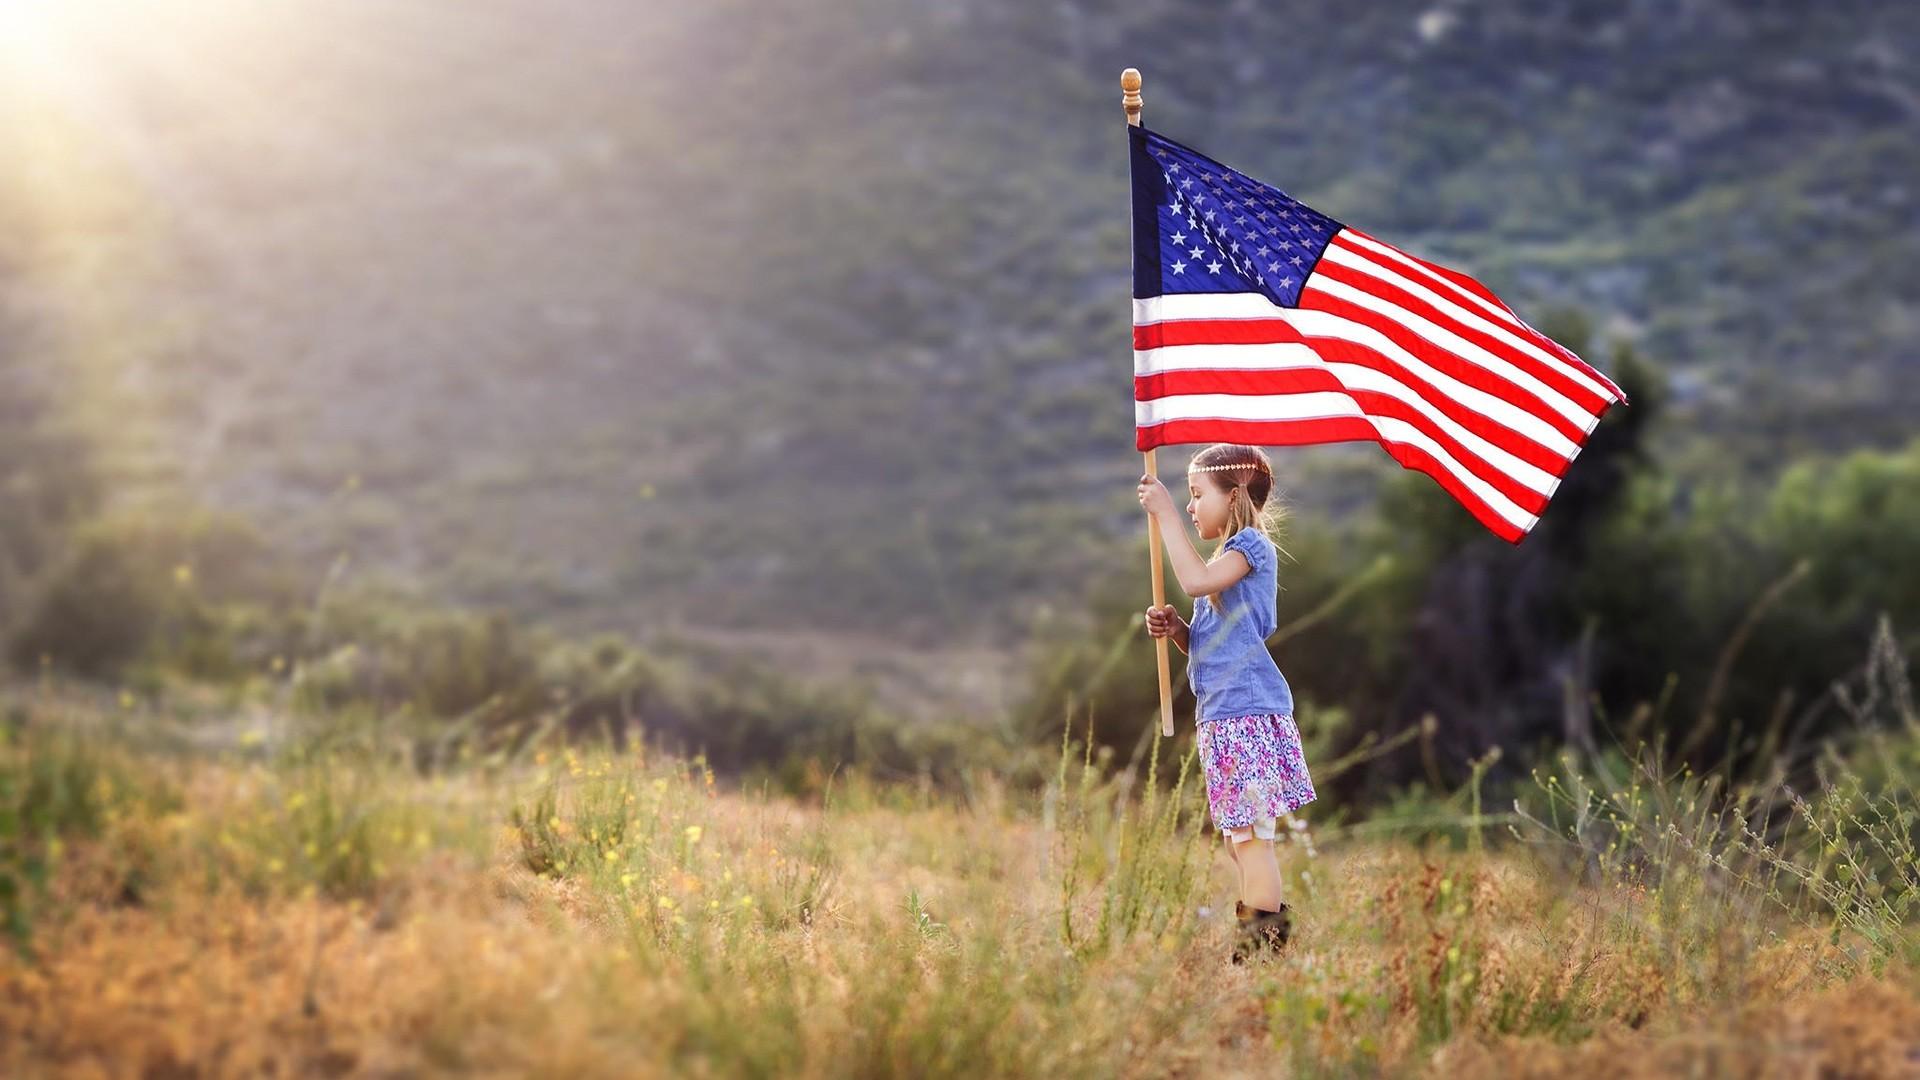 Patriotic HD Download